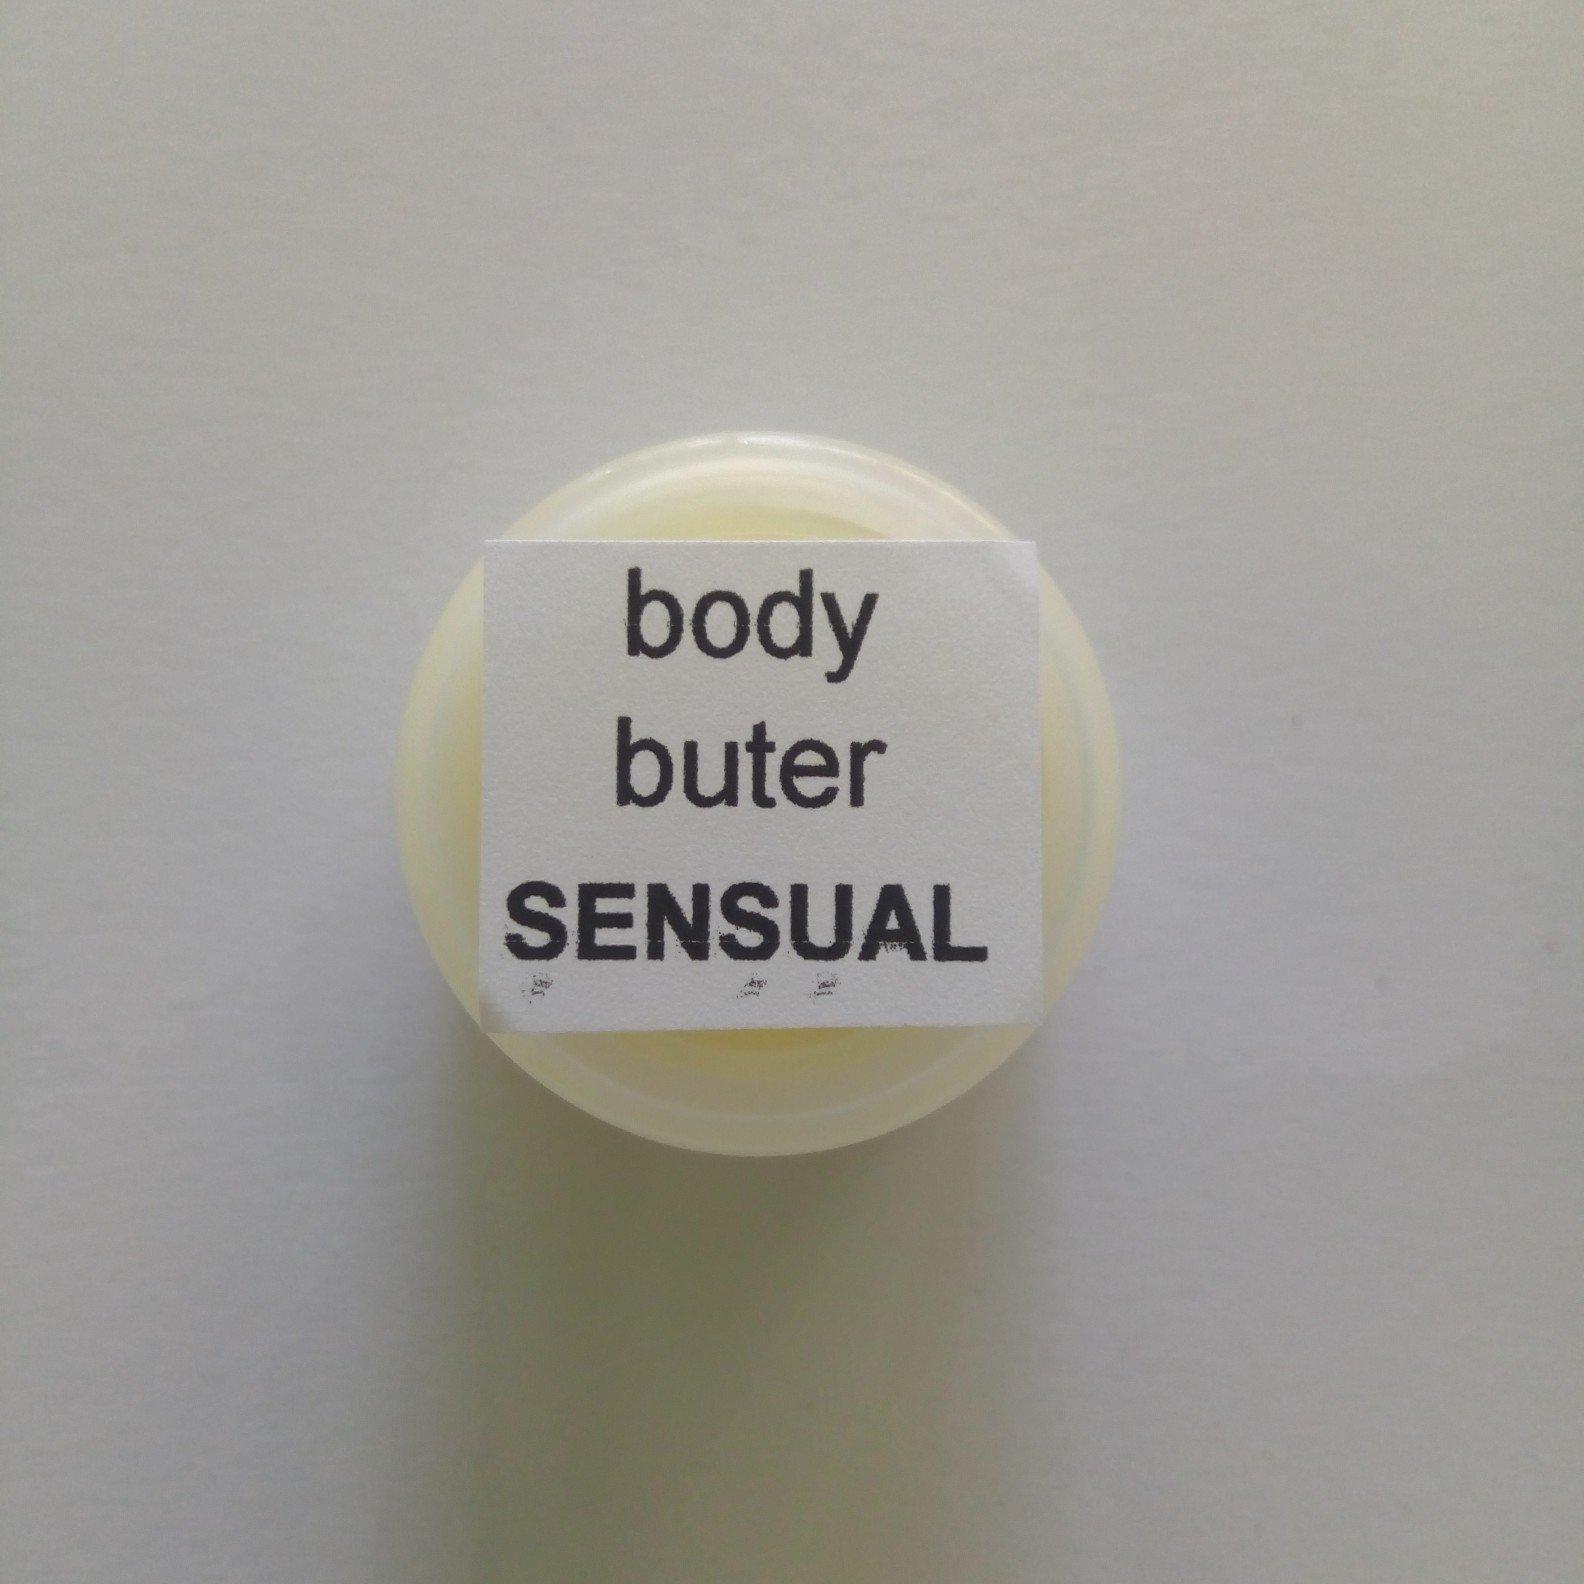 Herbateria - Tester body buter sensual 5 ml 00439